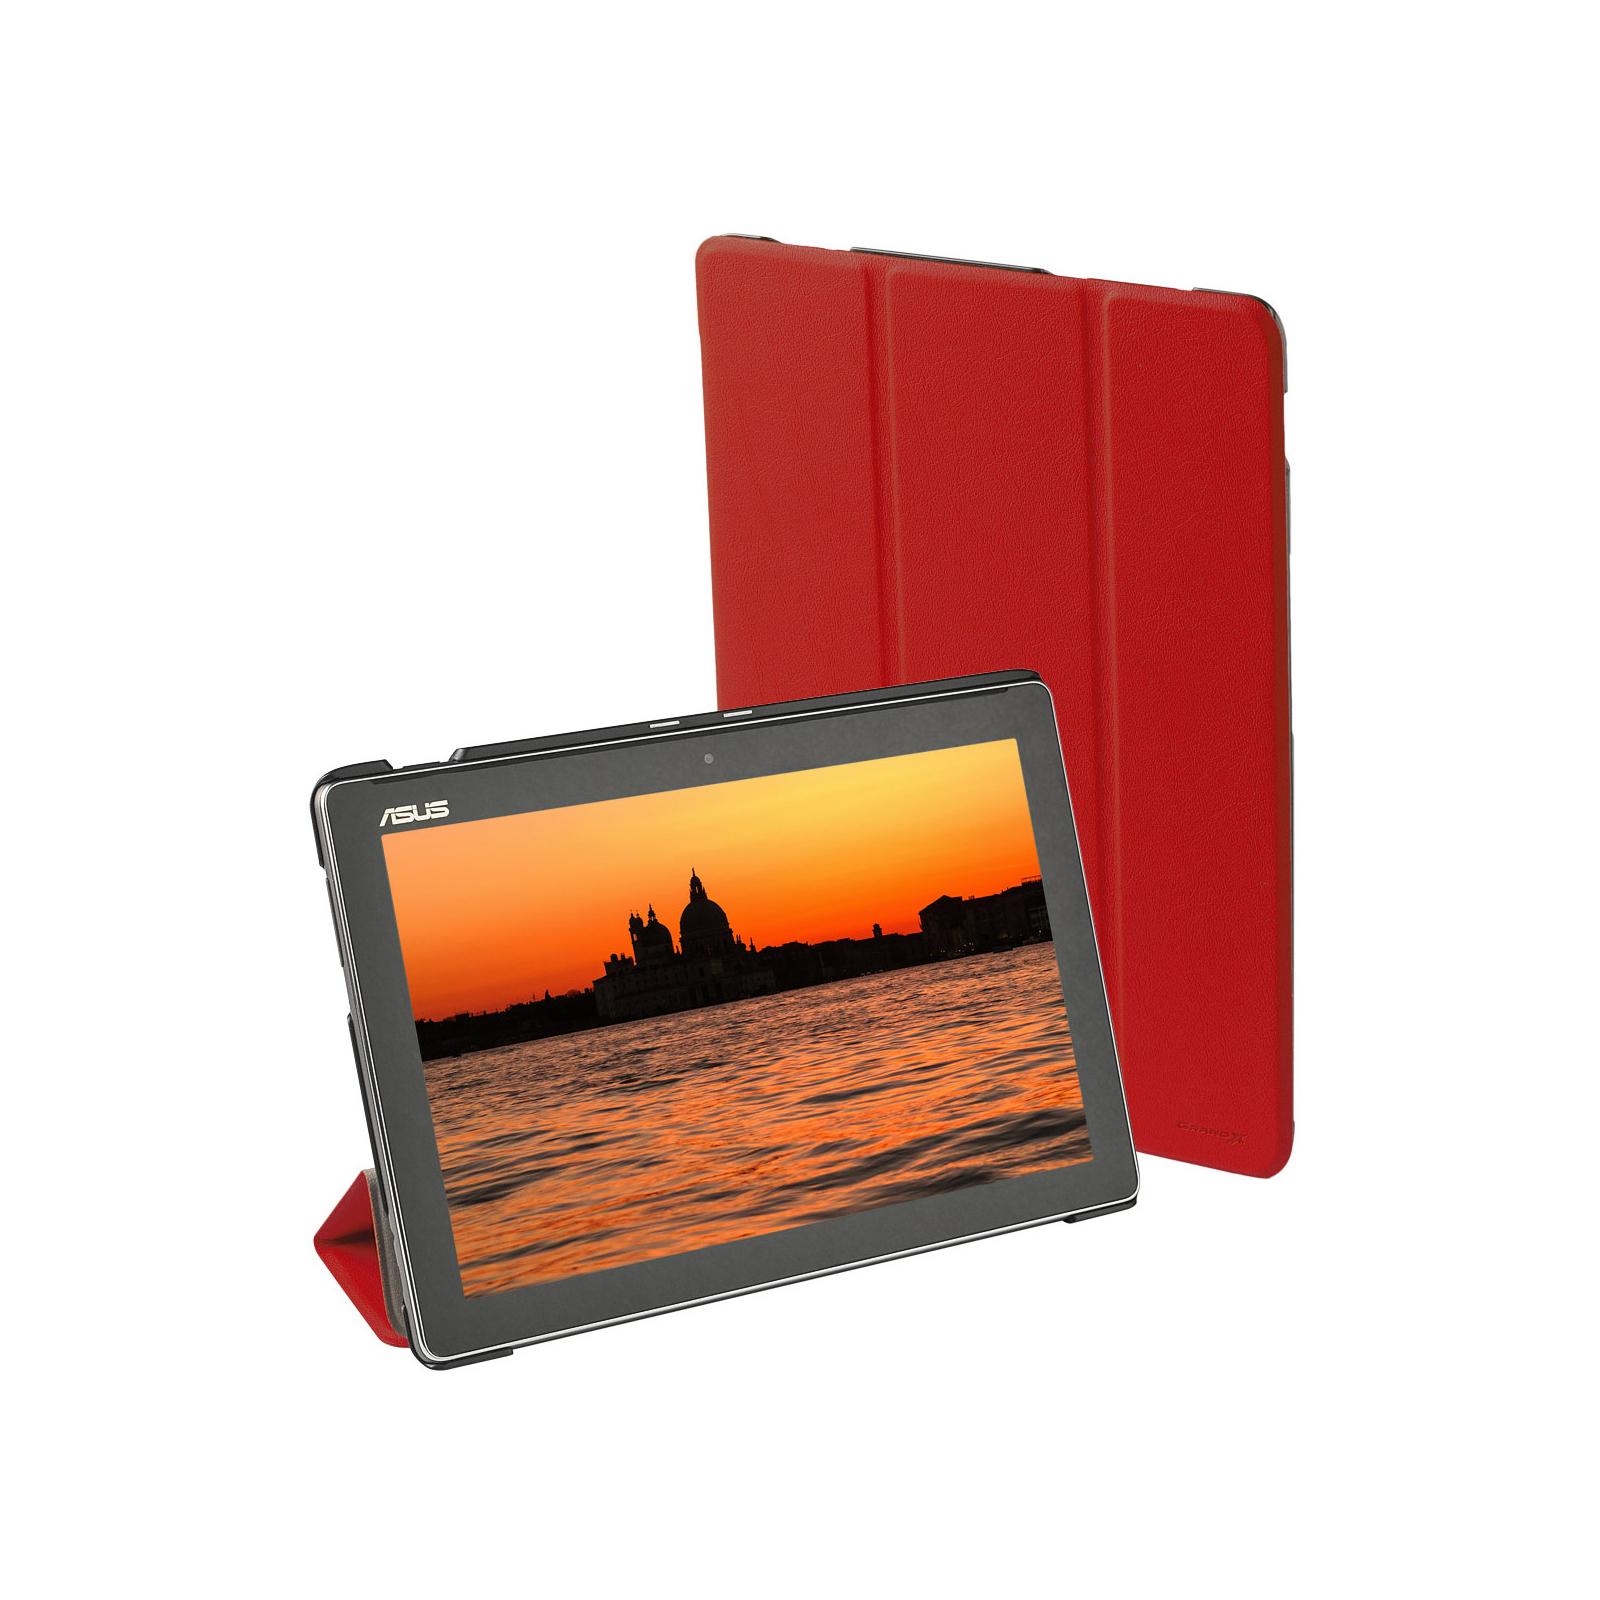 Чехол для планшета Grand-X ASUS ZenPad 10 Z300/Z300C Red (ATC - AZPZ300R) изображение 7